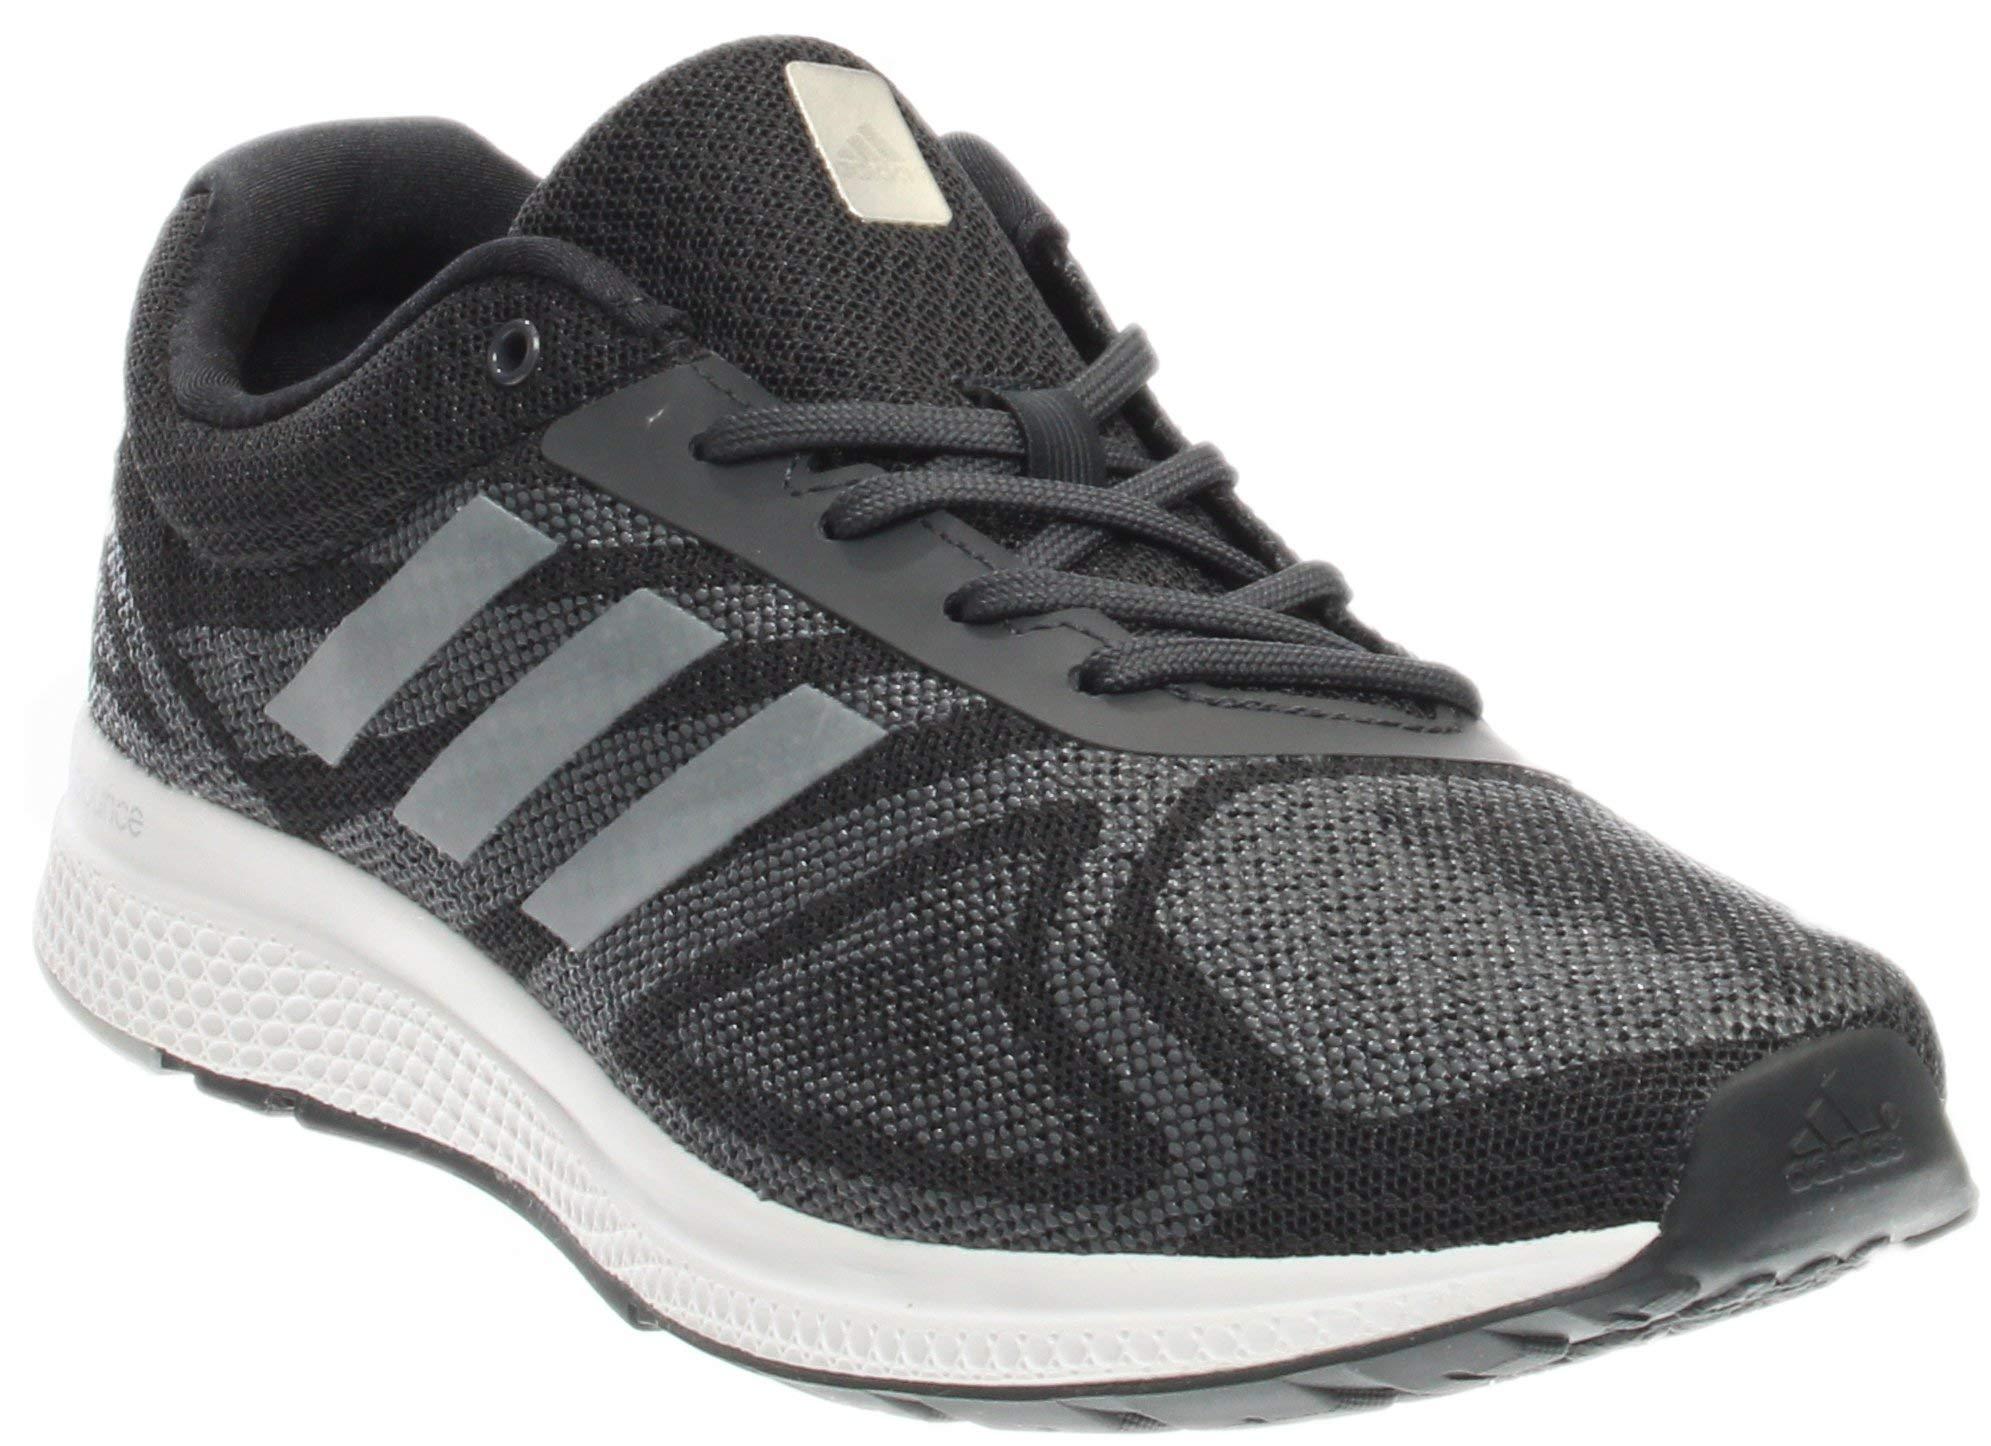 ca6b4176a Galleon - Adidas Women s MANA Bounce W Running Shoe